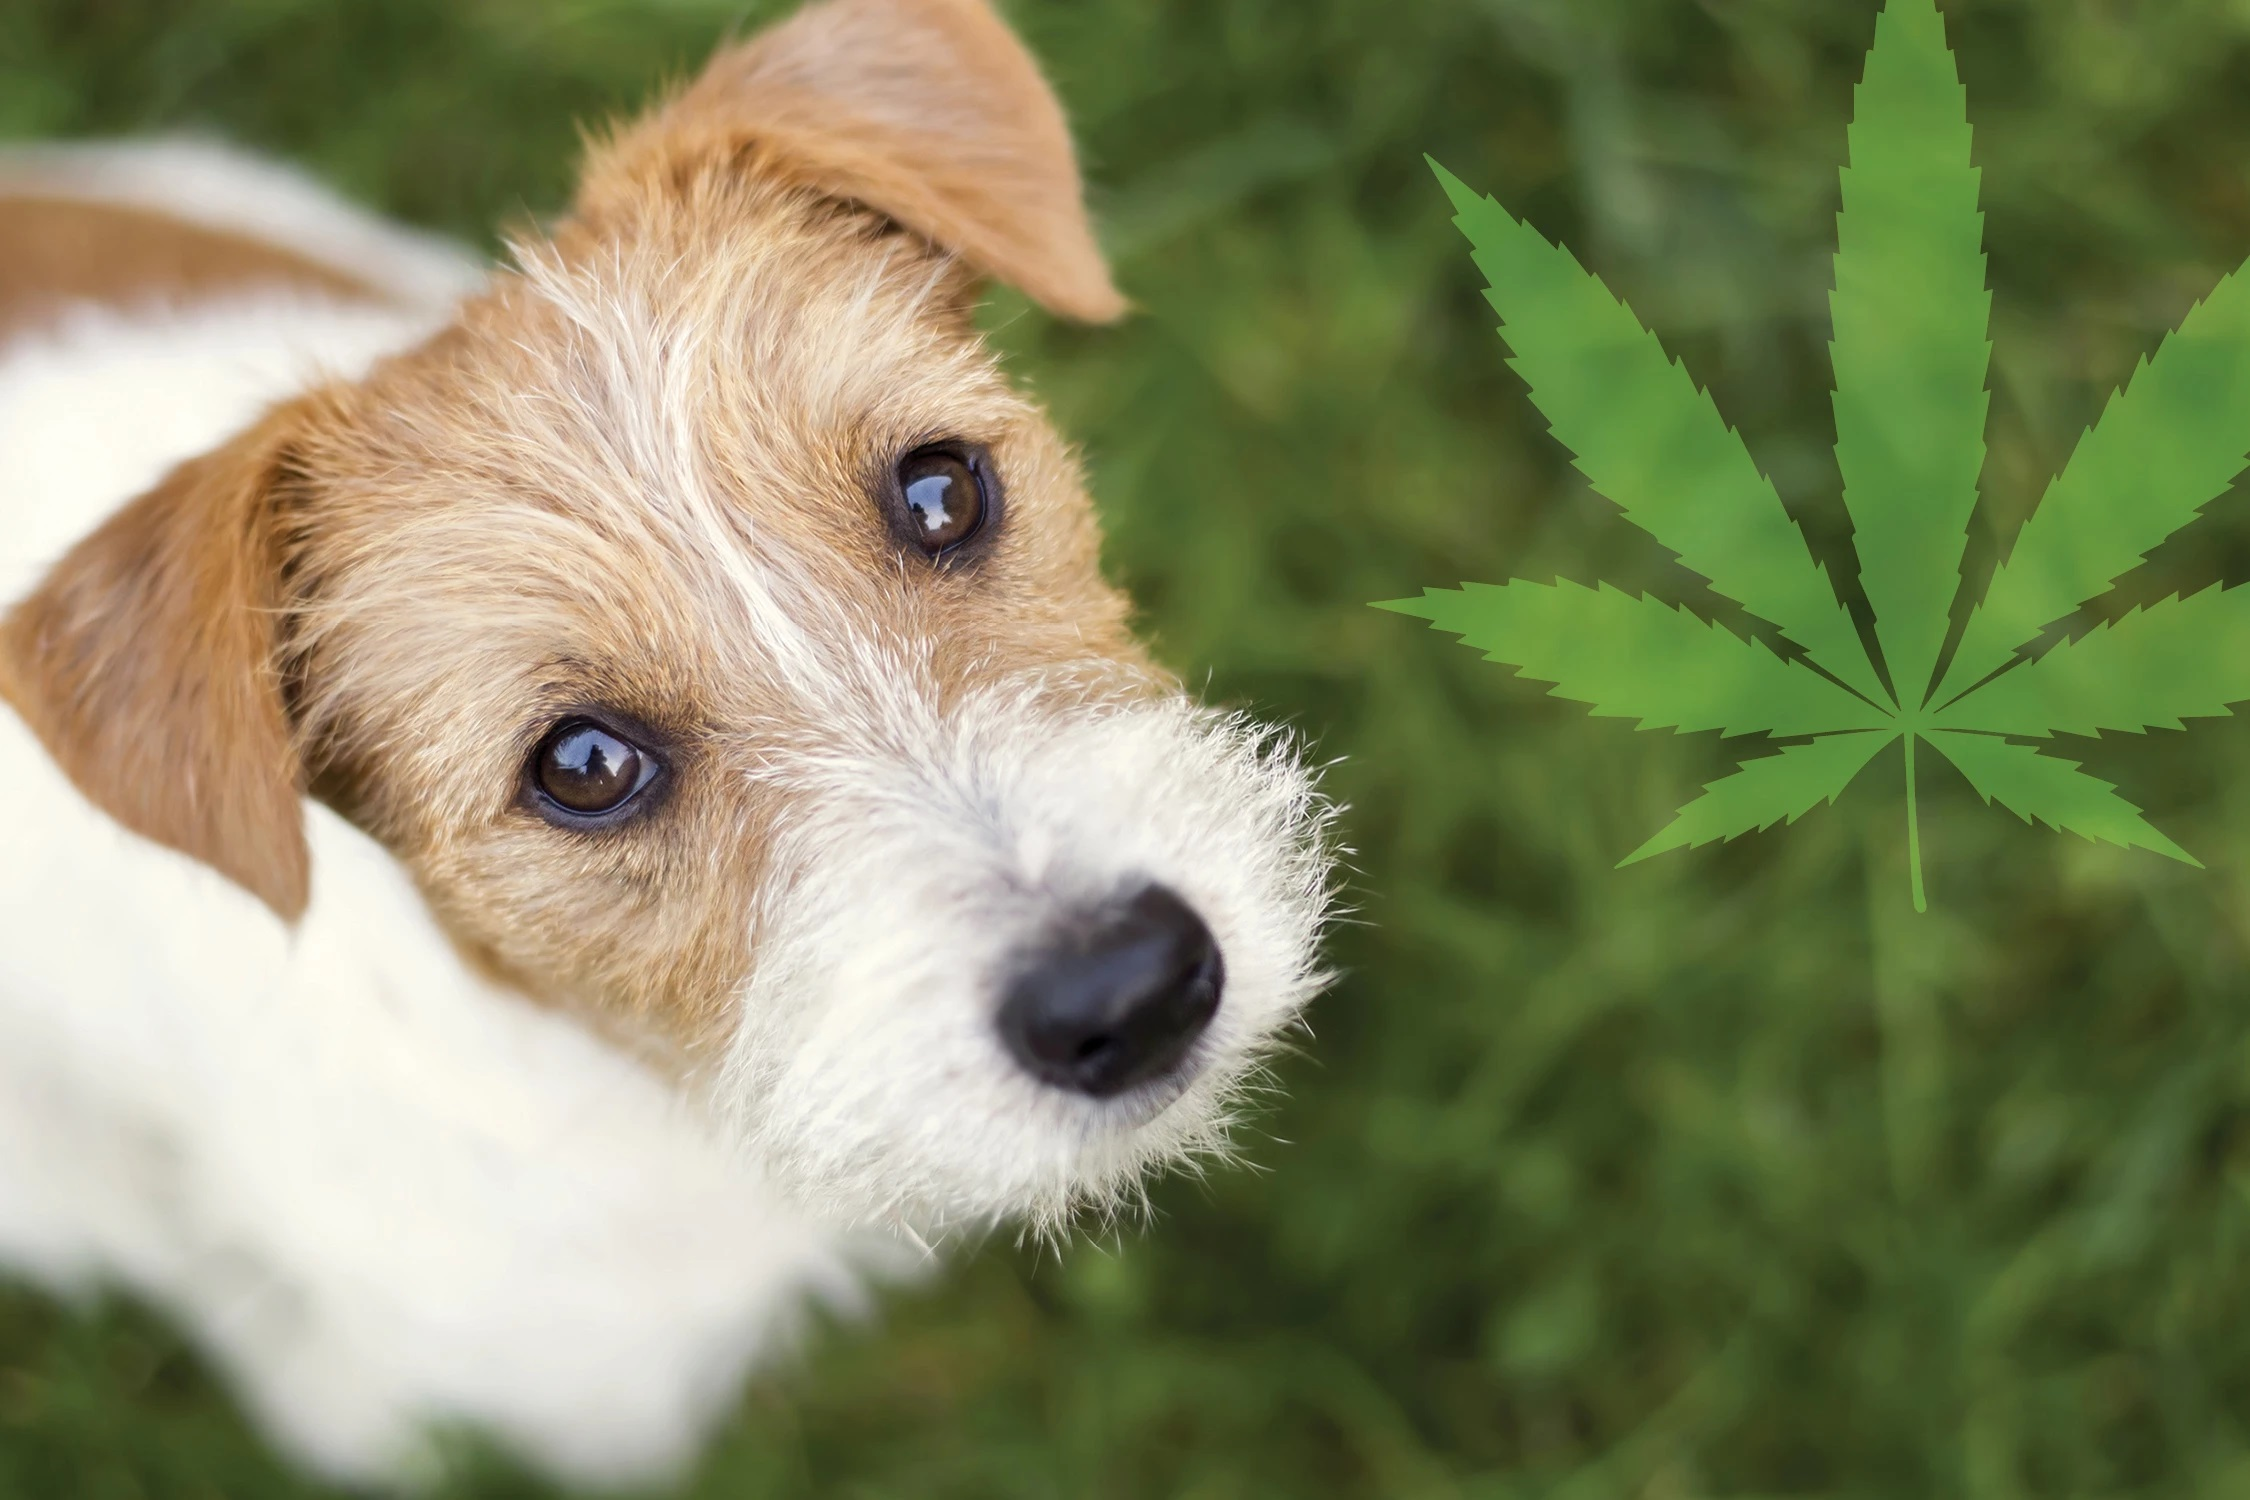 Hemp CBD Oil Can Boost Your Dog's Wellness